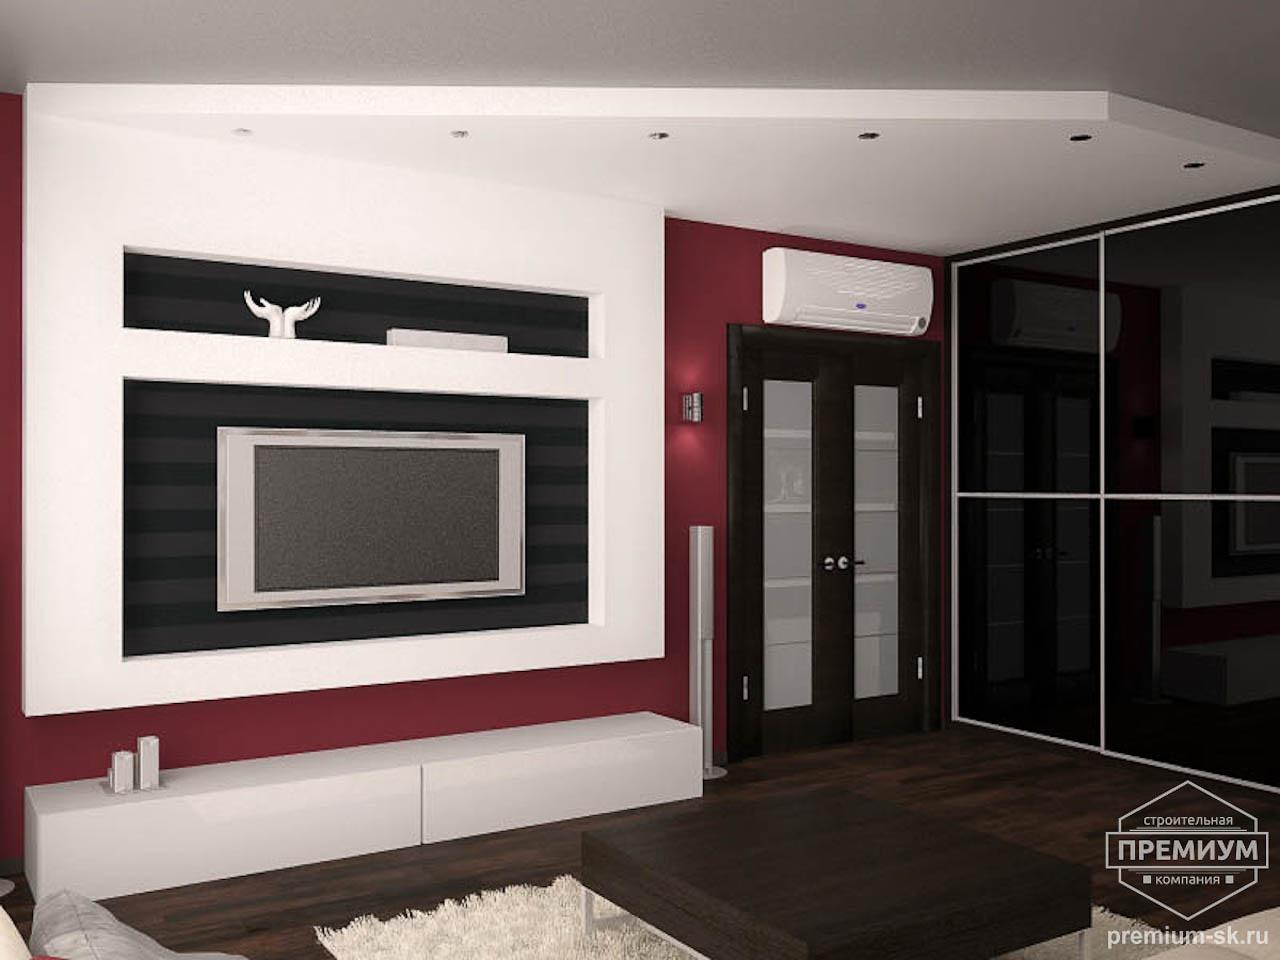 Дизайн интерьера однокомнатной квартиры по ул. Сыромолотова 11 img1849476093